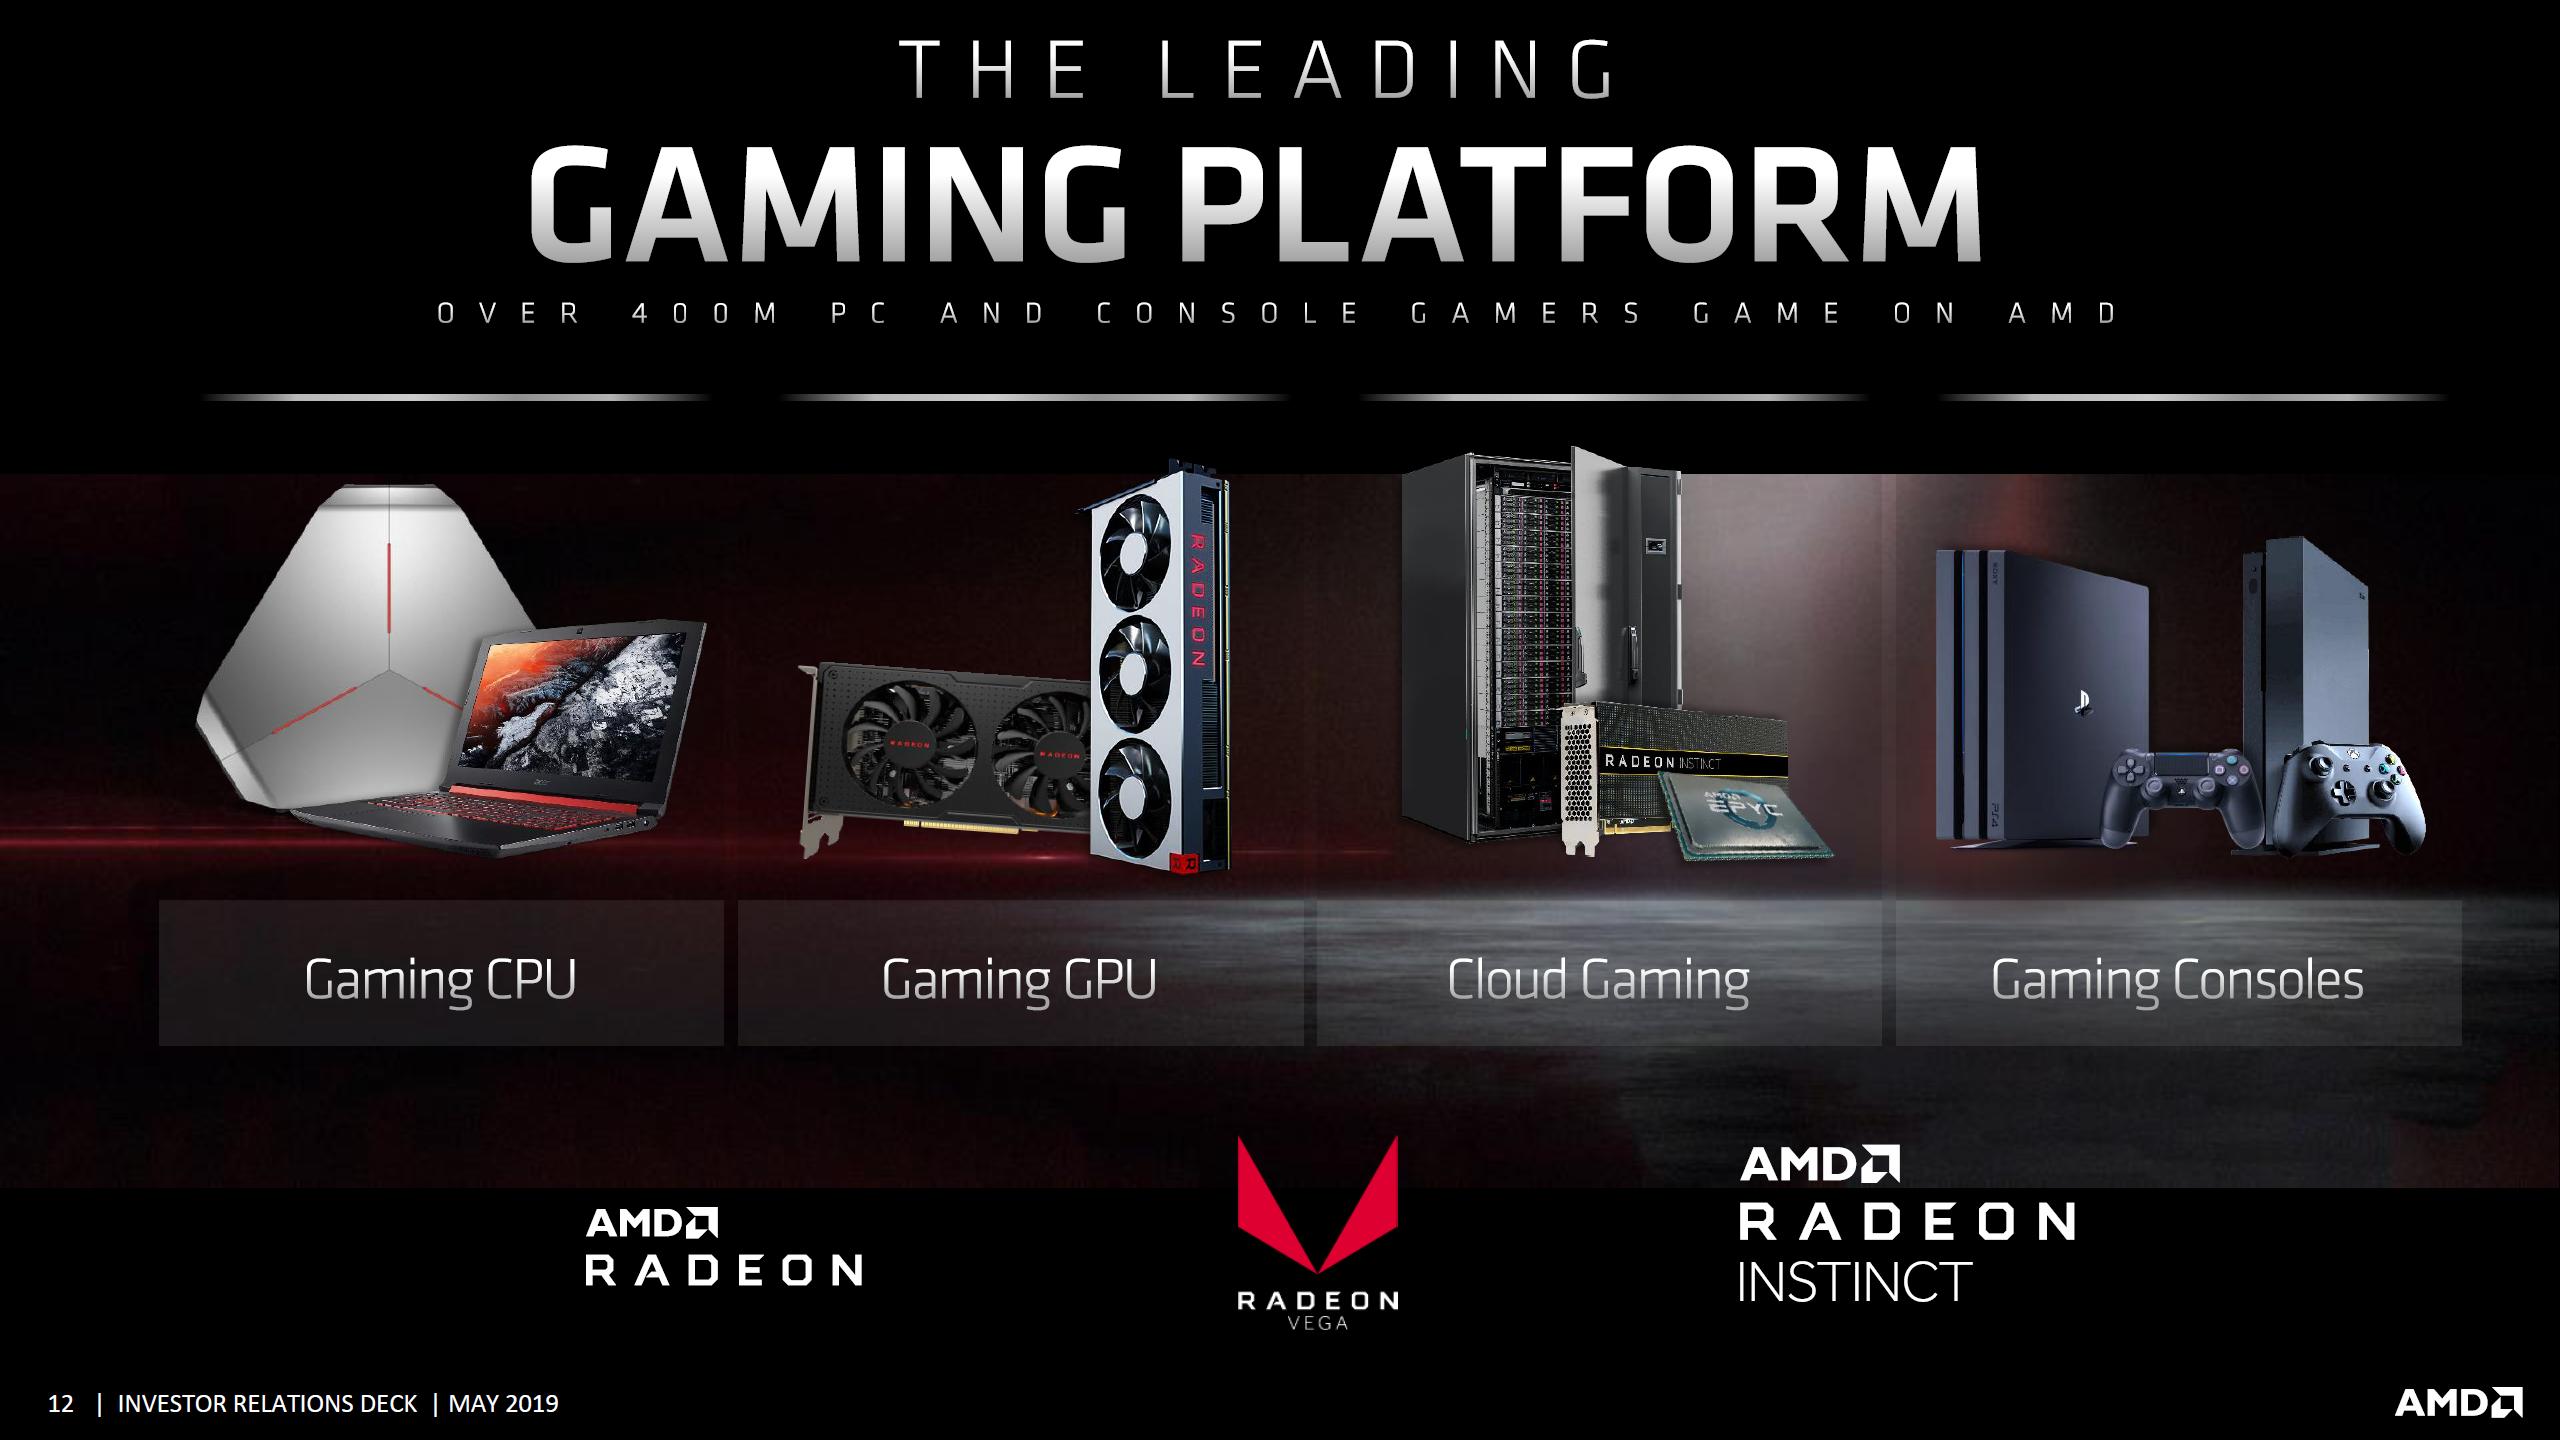 Best Radeon Graphics Card 2020 AMD Navi 20 GPU Delayed Till 2020, 7nm Radeon RX Navi Specs Rumor